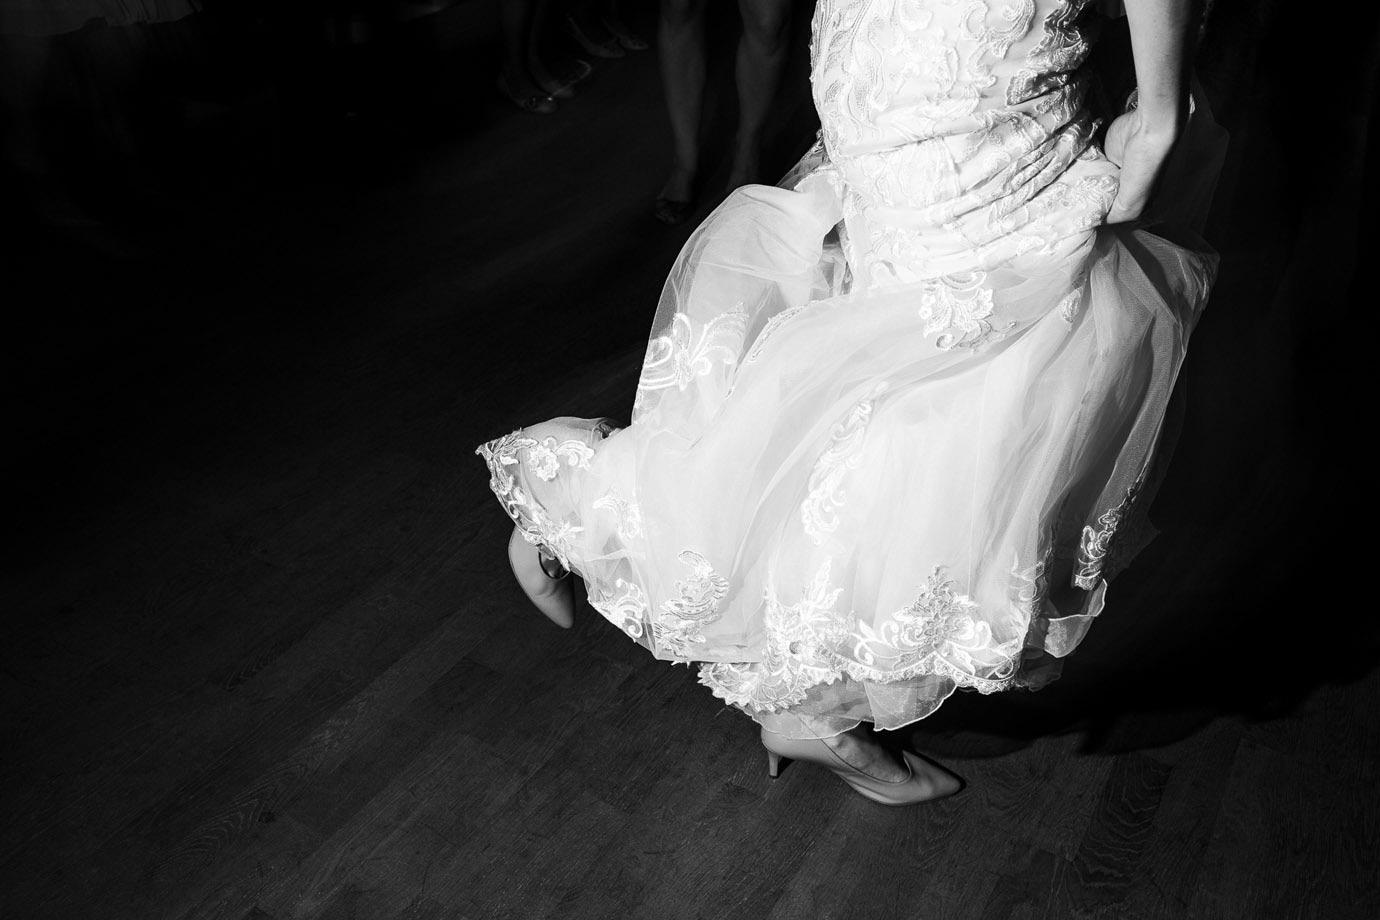 suknia biała na ślub